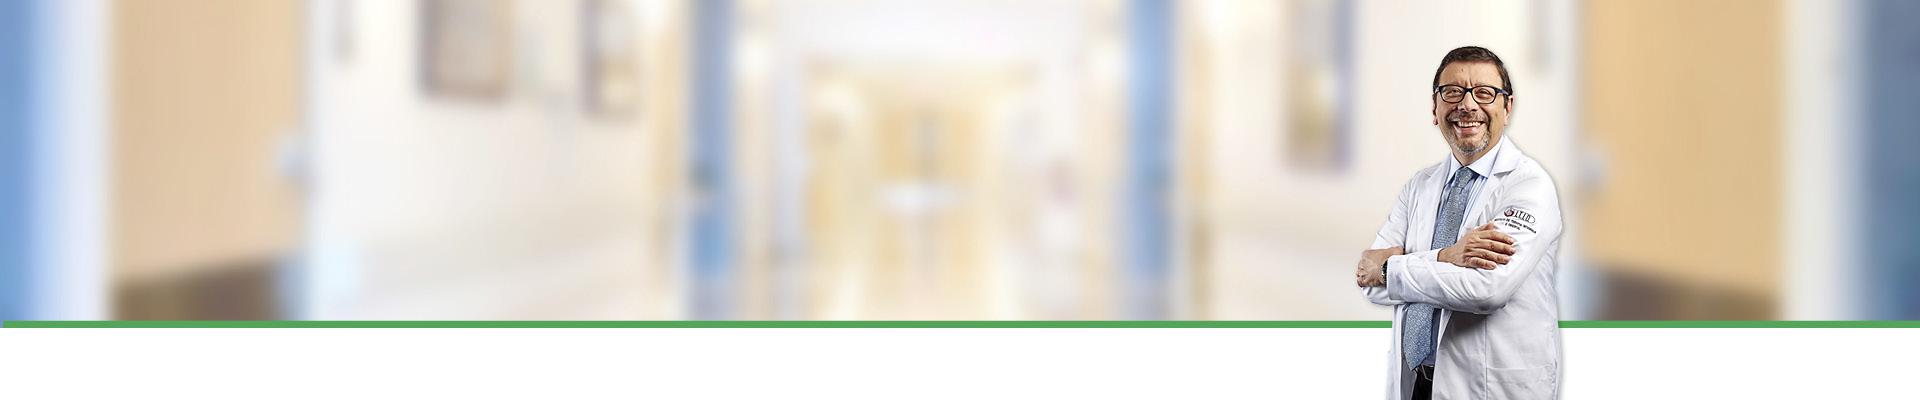 Banner 4 blank diag pediatria